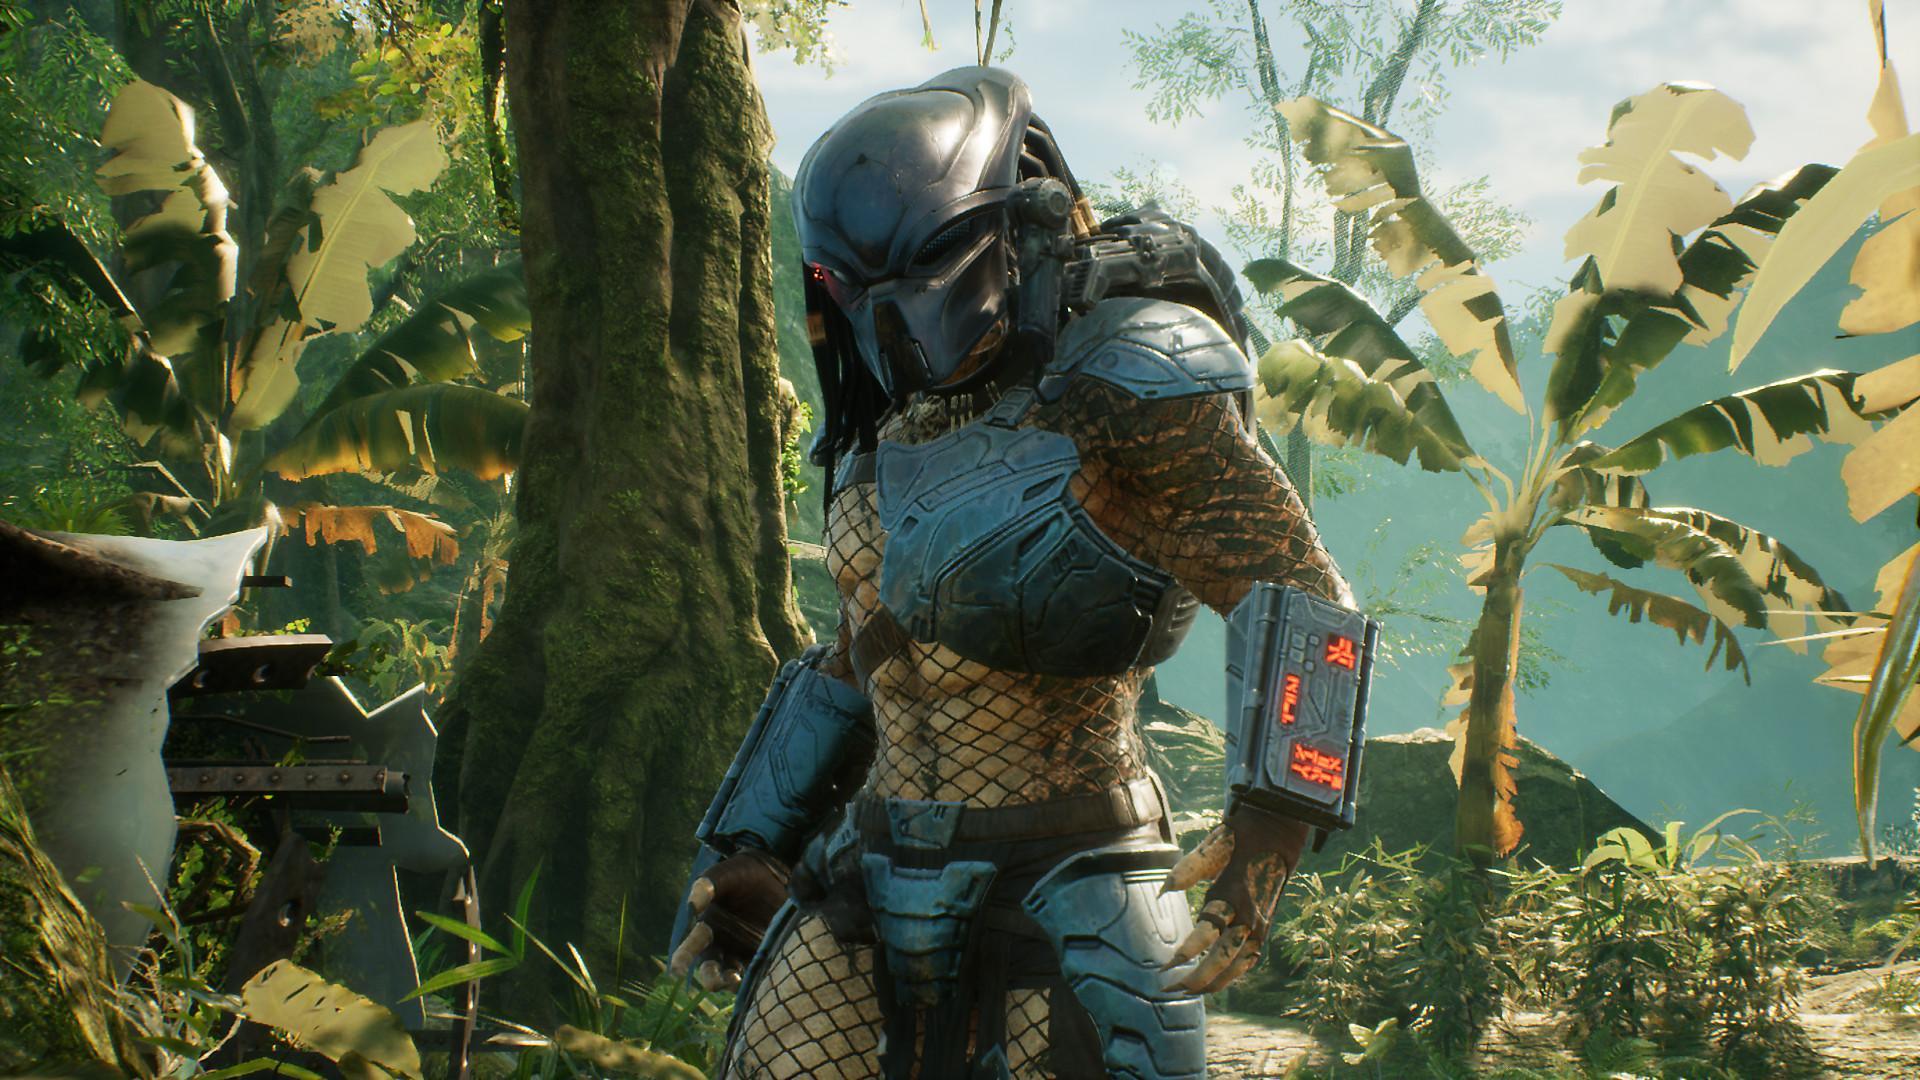 Слух: в Fortnite добавят экипировку Хищника